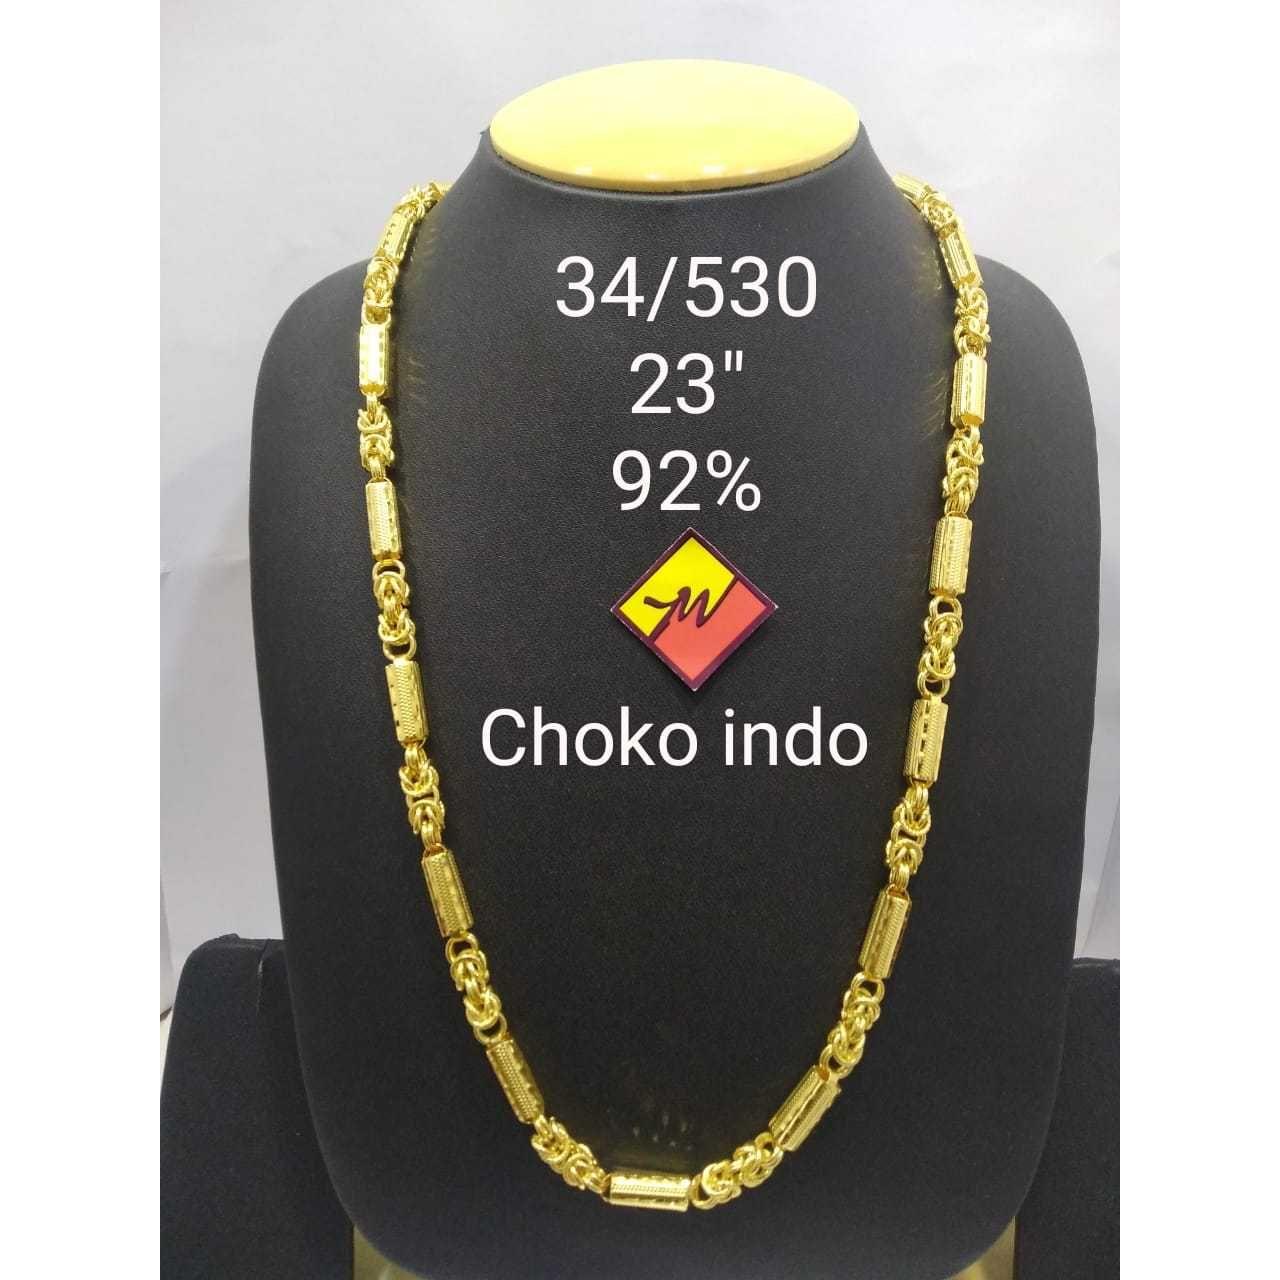 Choko indo